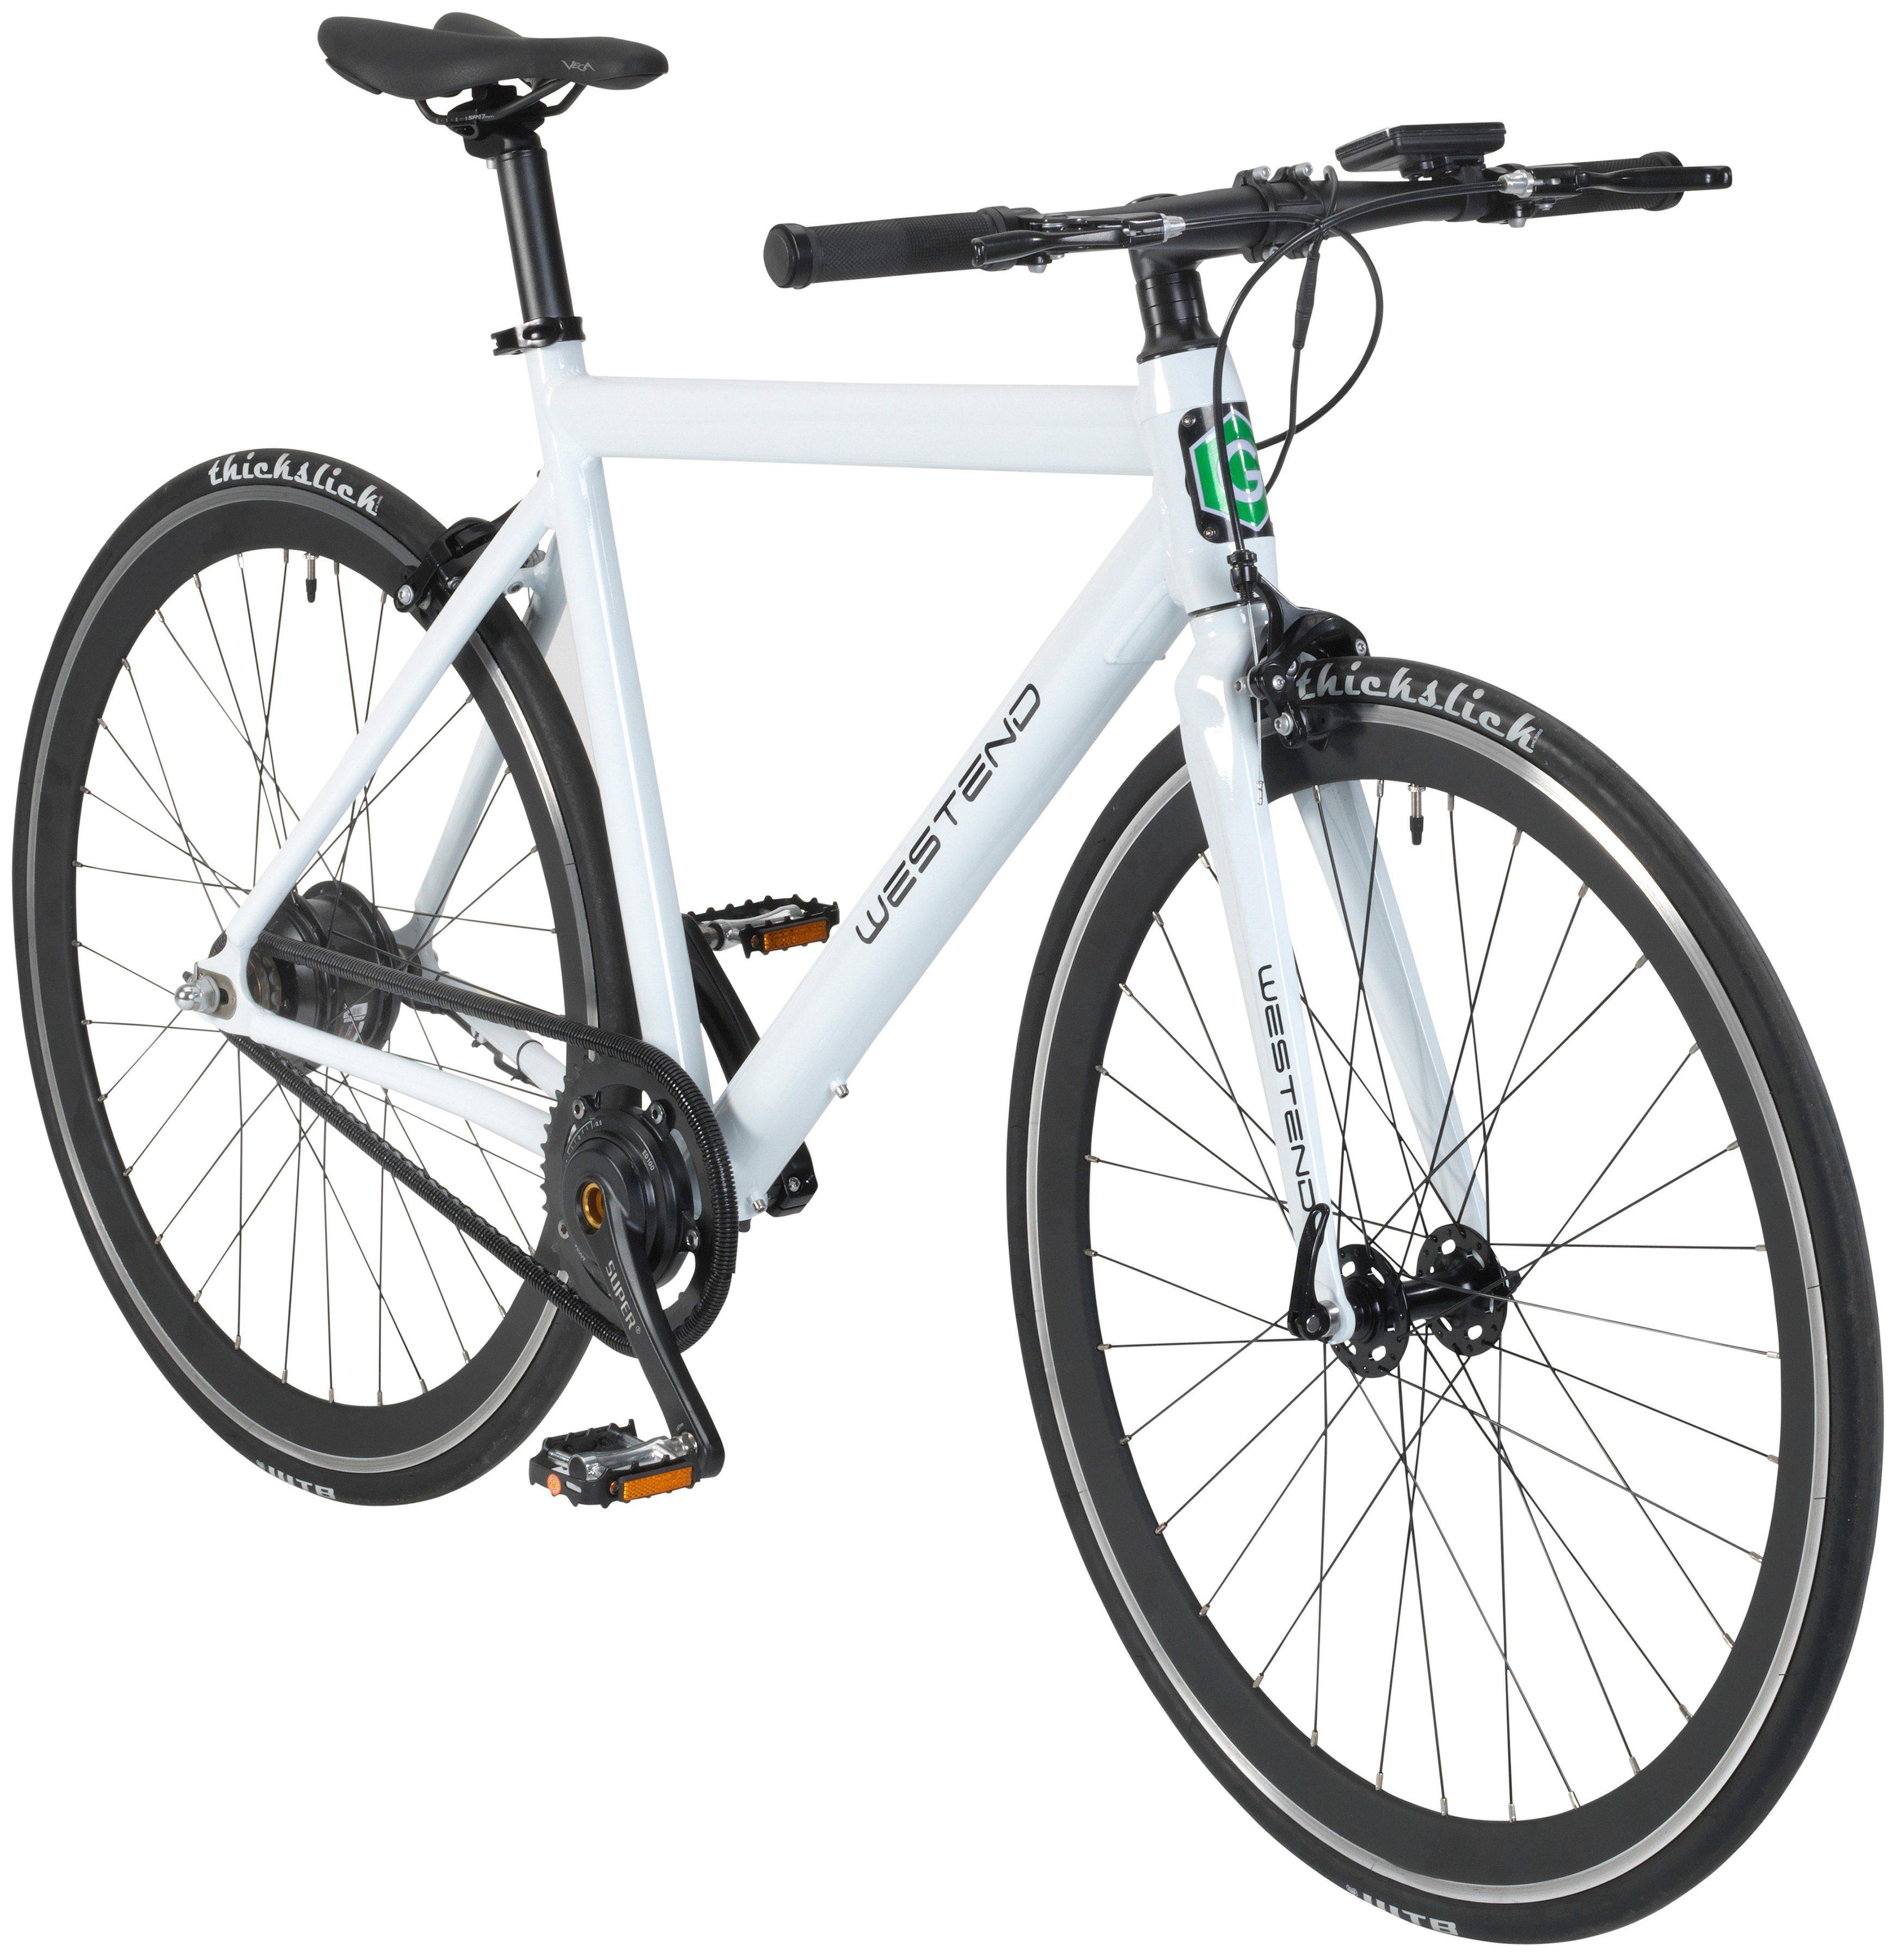 GREENSTREET E-Bike City »Westend«, 28 Zoll, Heckmotor, 245 Wh